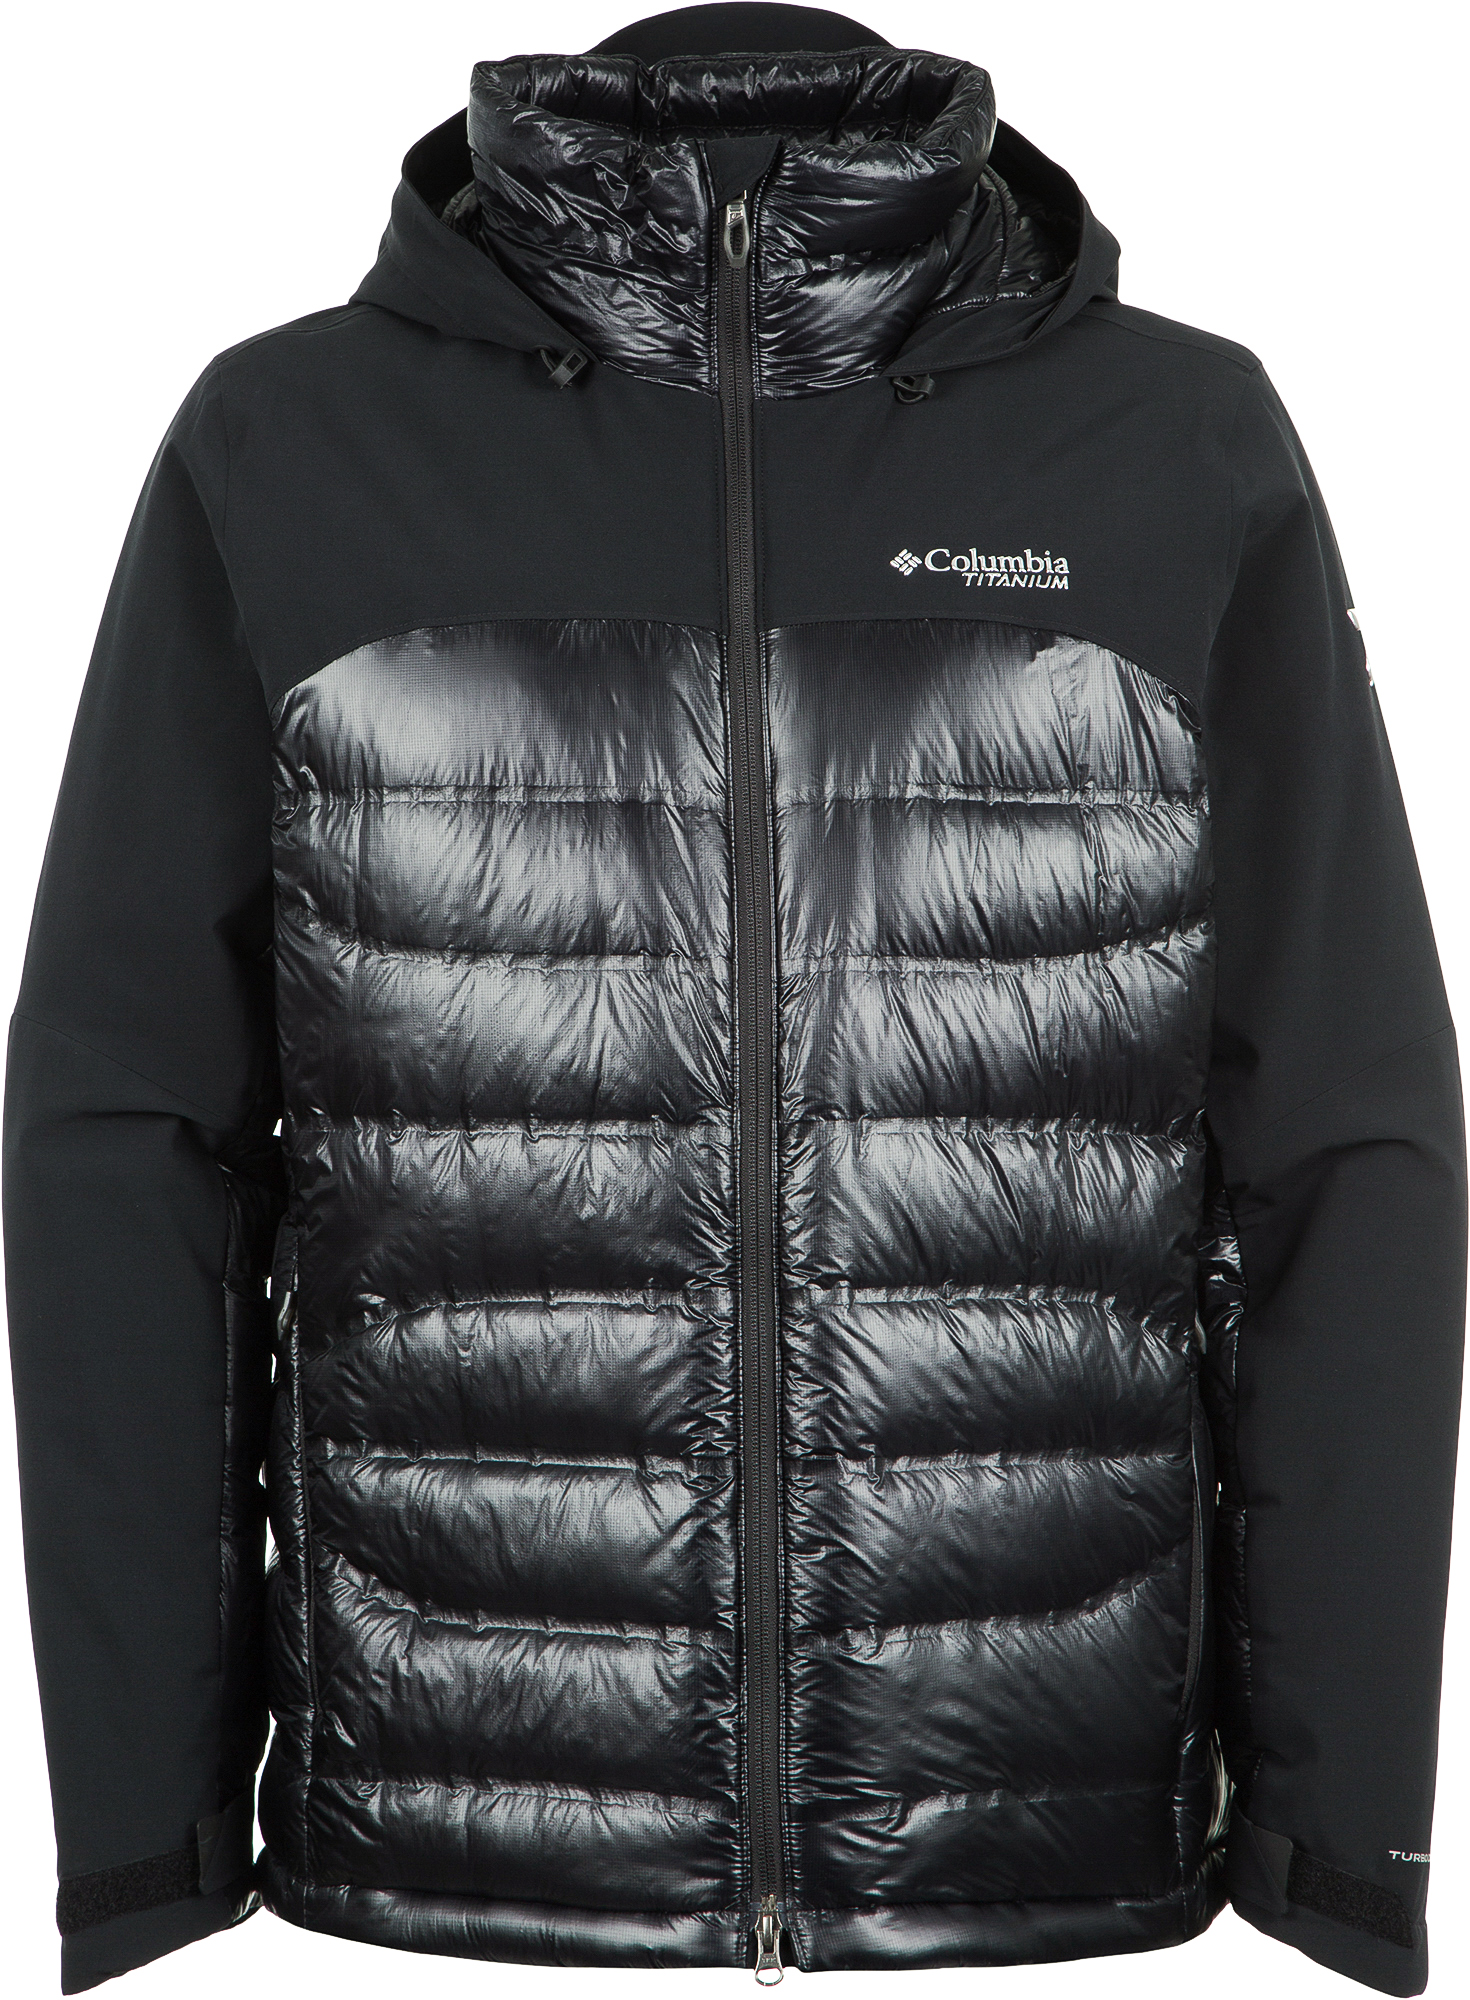 Columbia Куртка пуховая мужская Heatzone 1000 TurboDown II, размер 46